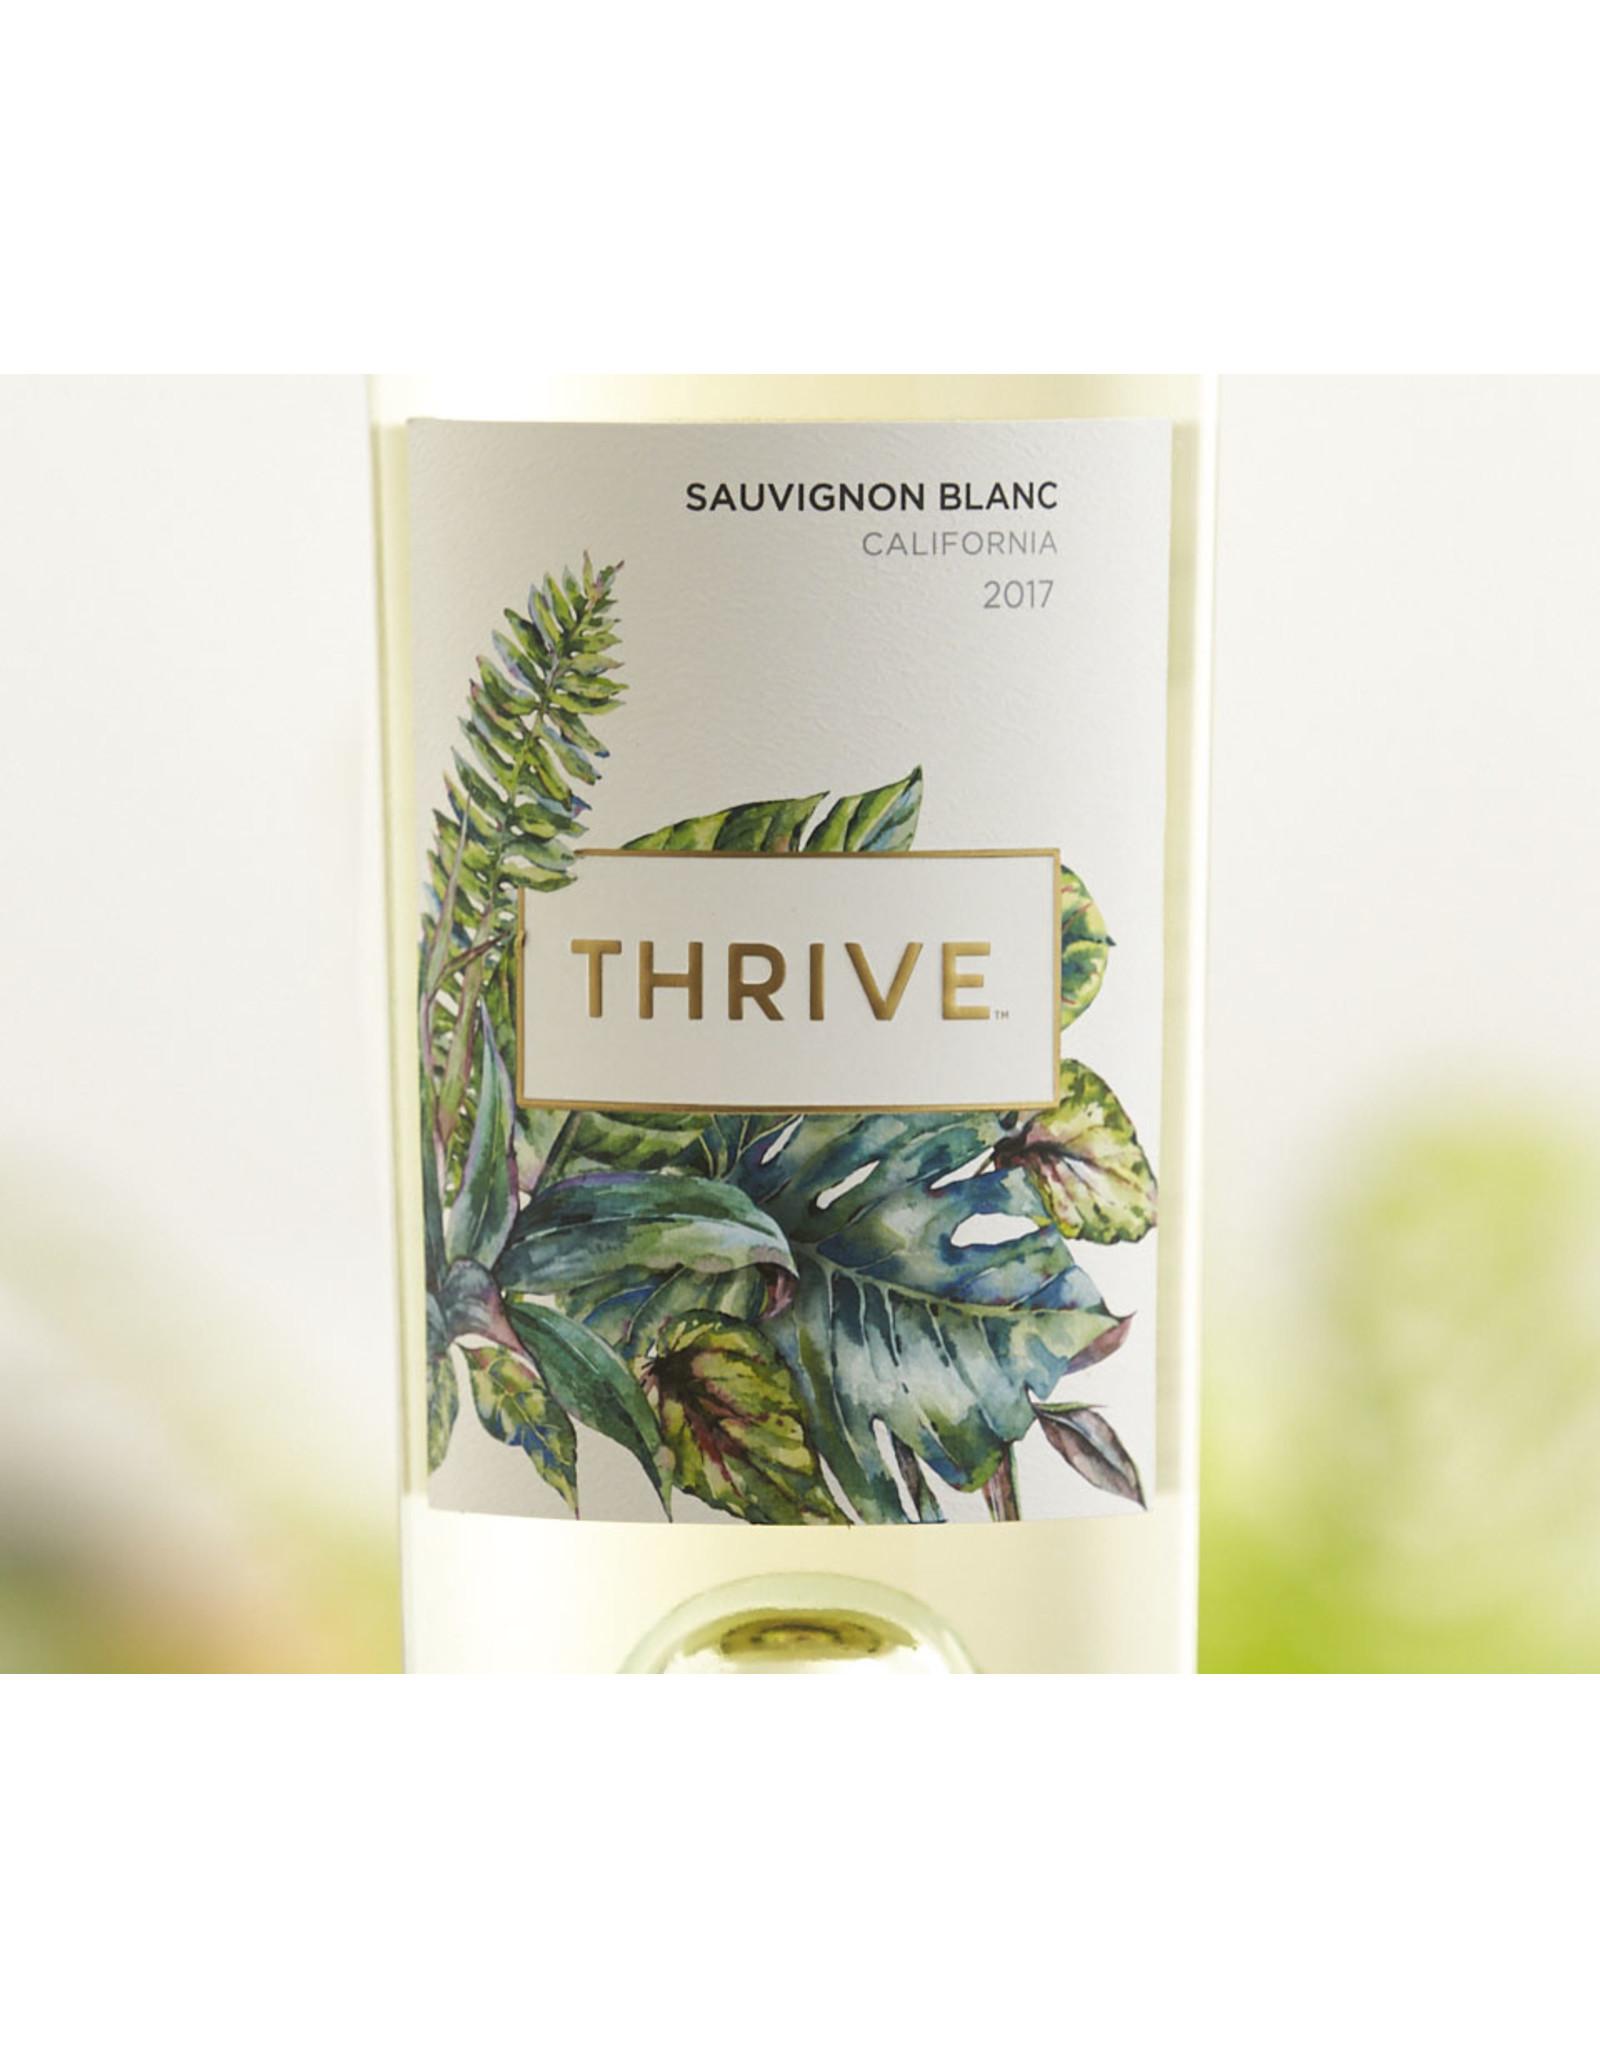 Thrive Sauvignon Blanc